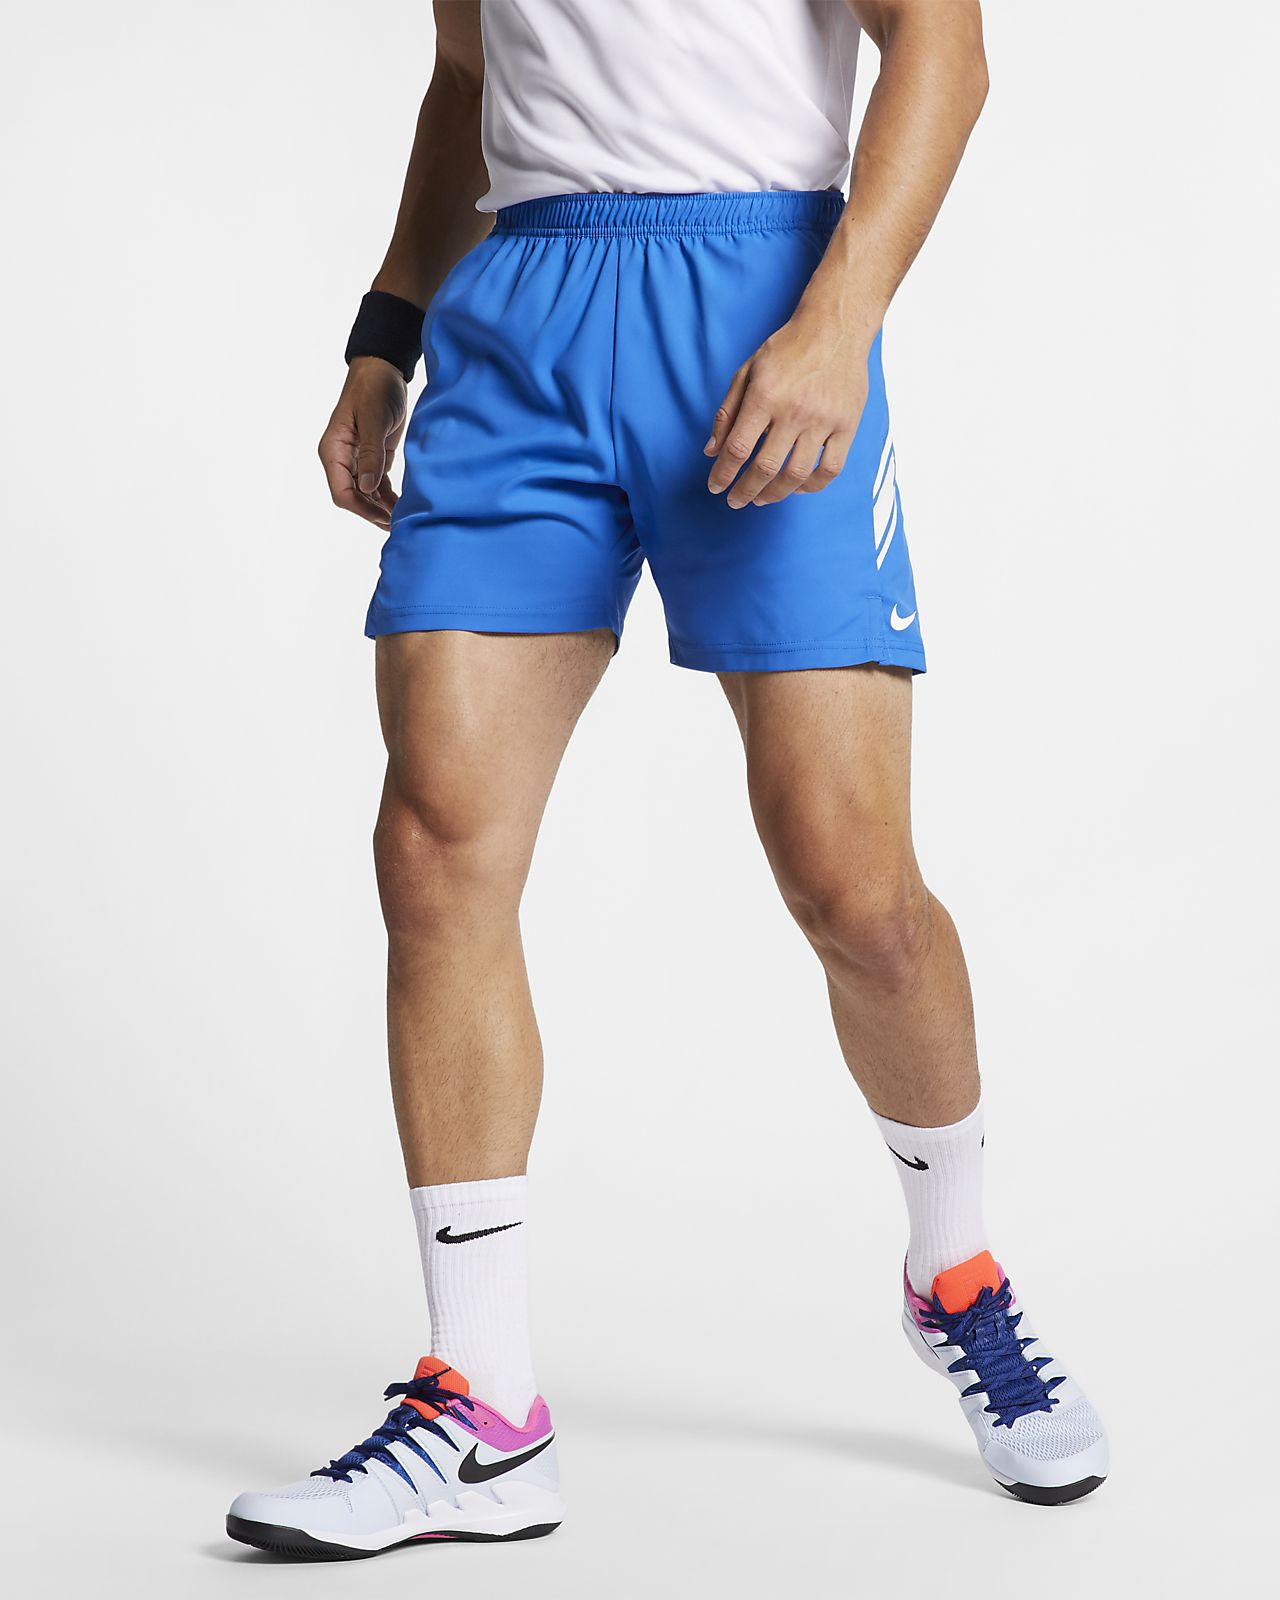 NikeCourt Dri-FIT Pantalón corto de tenis - Hombre